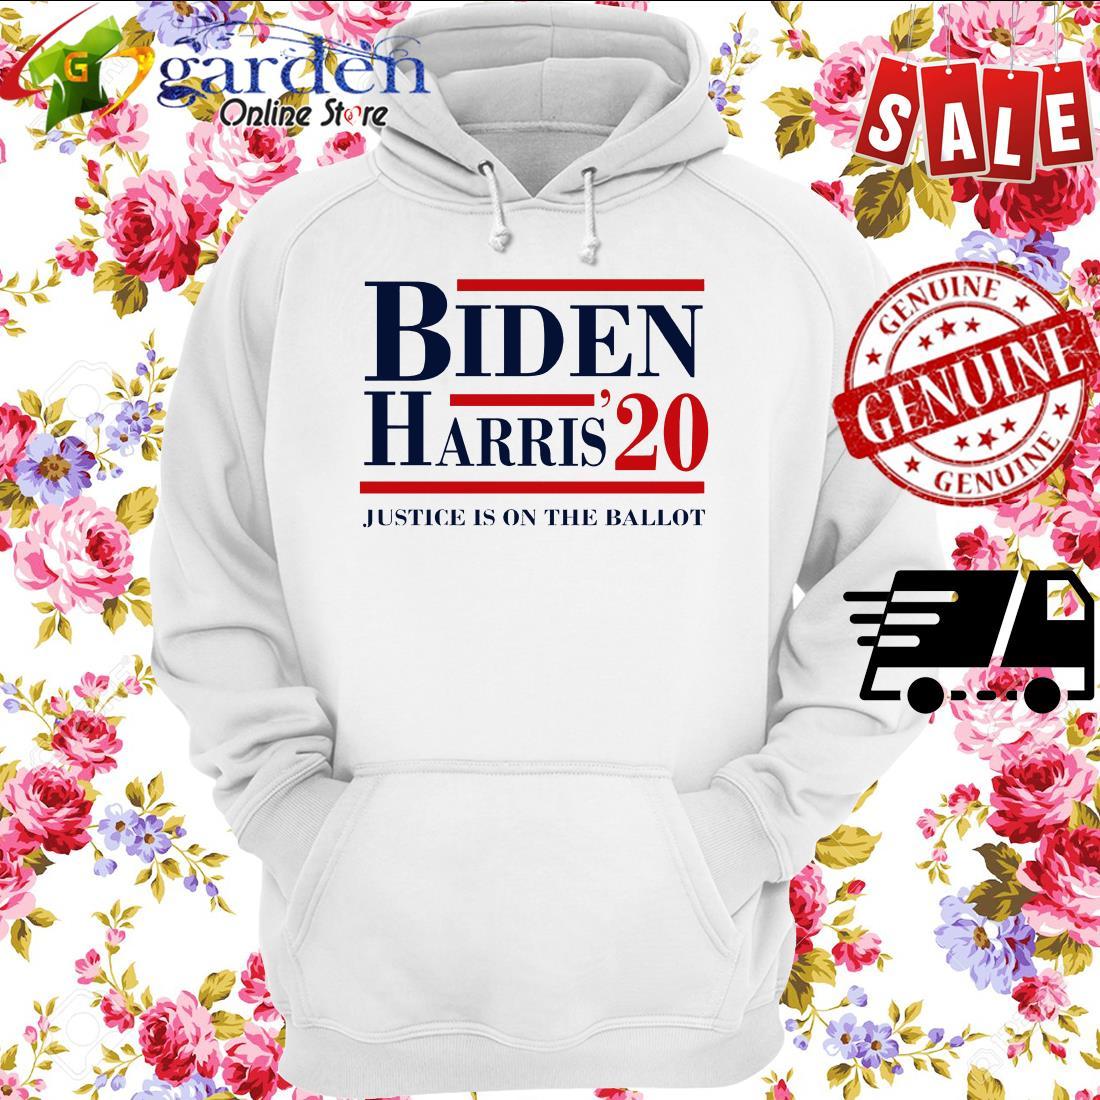 Joe Biden Kamala Harris 2020 justice is on the ballot hoodie